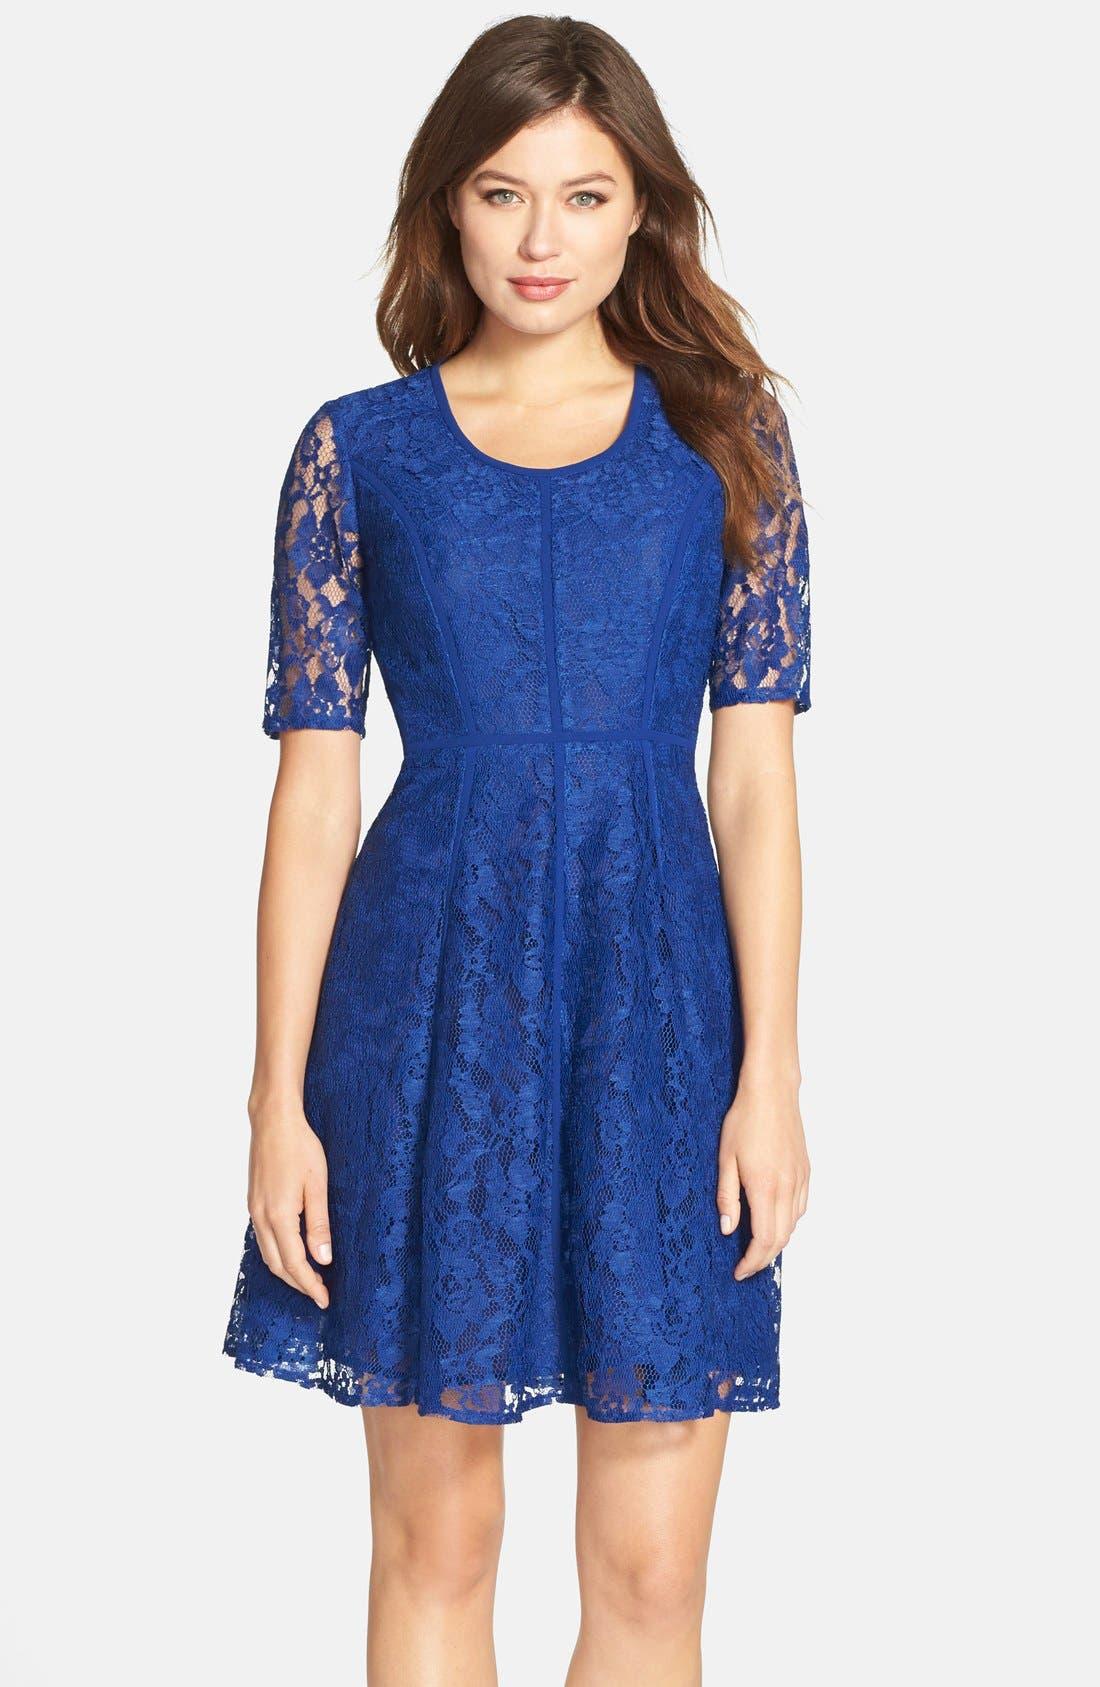 Main Image - Gabby Skye Lace Fit & Flare Dress